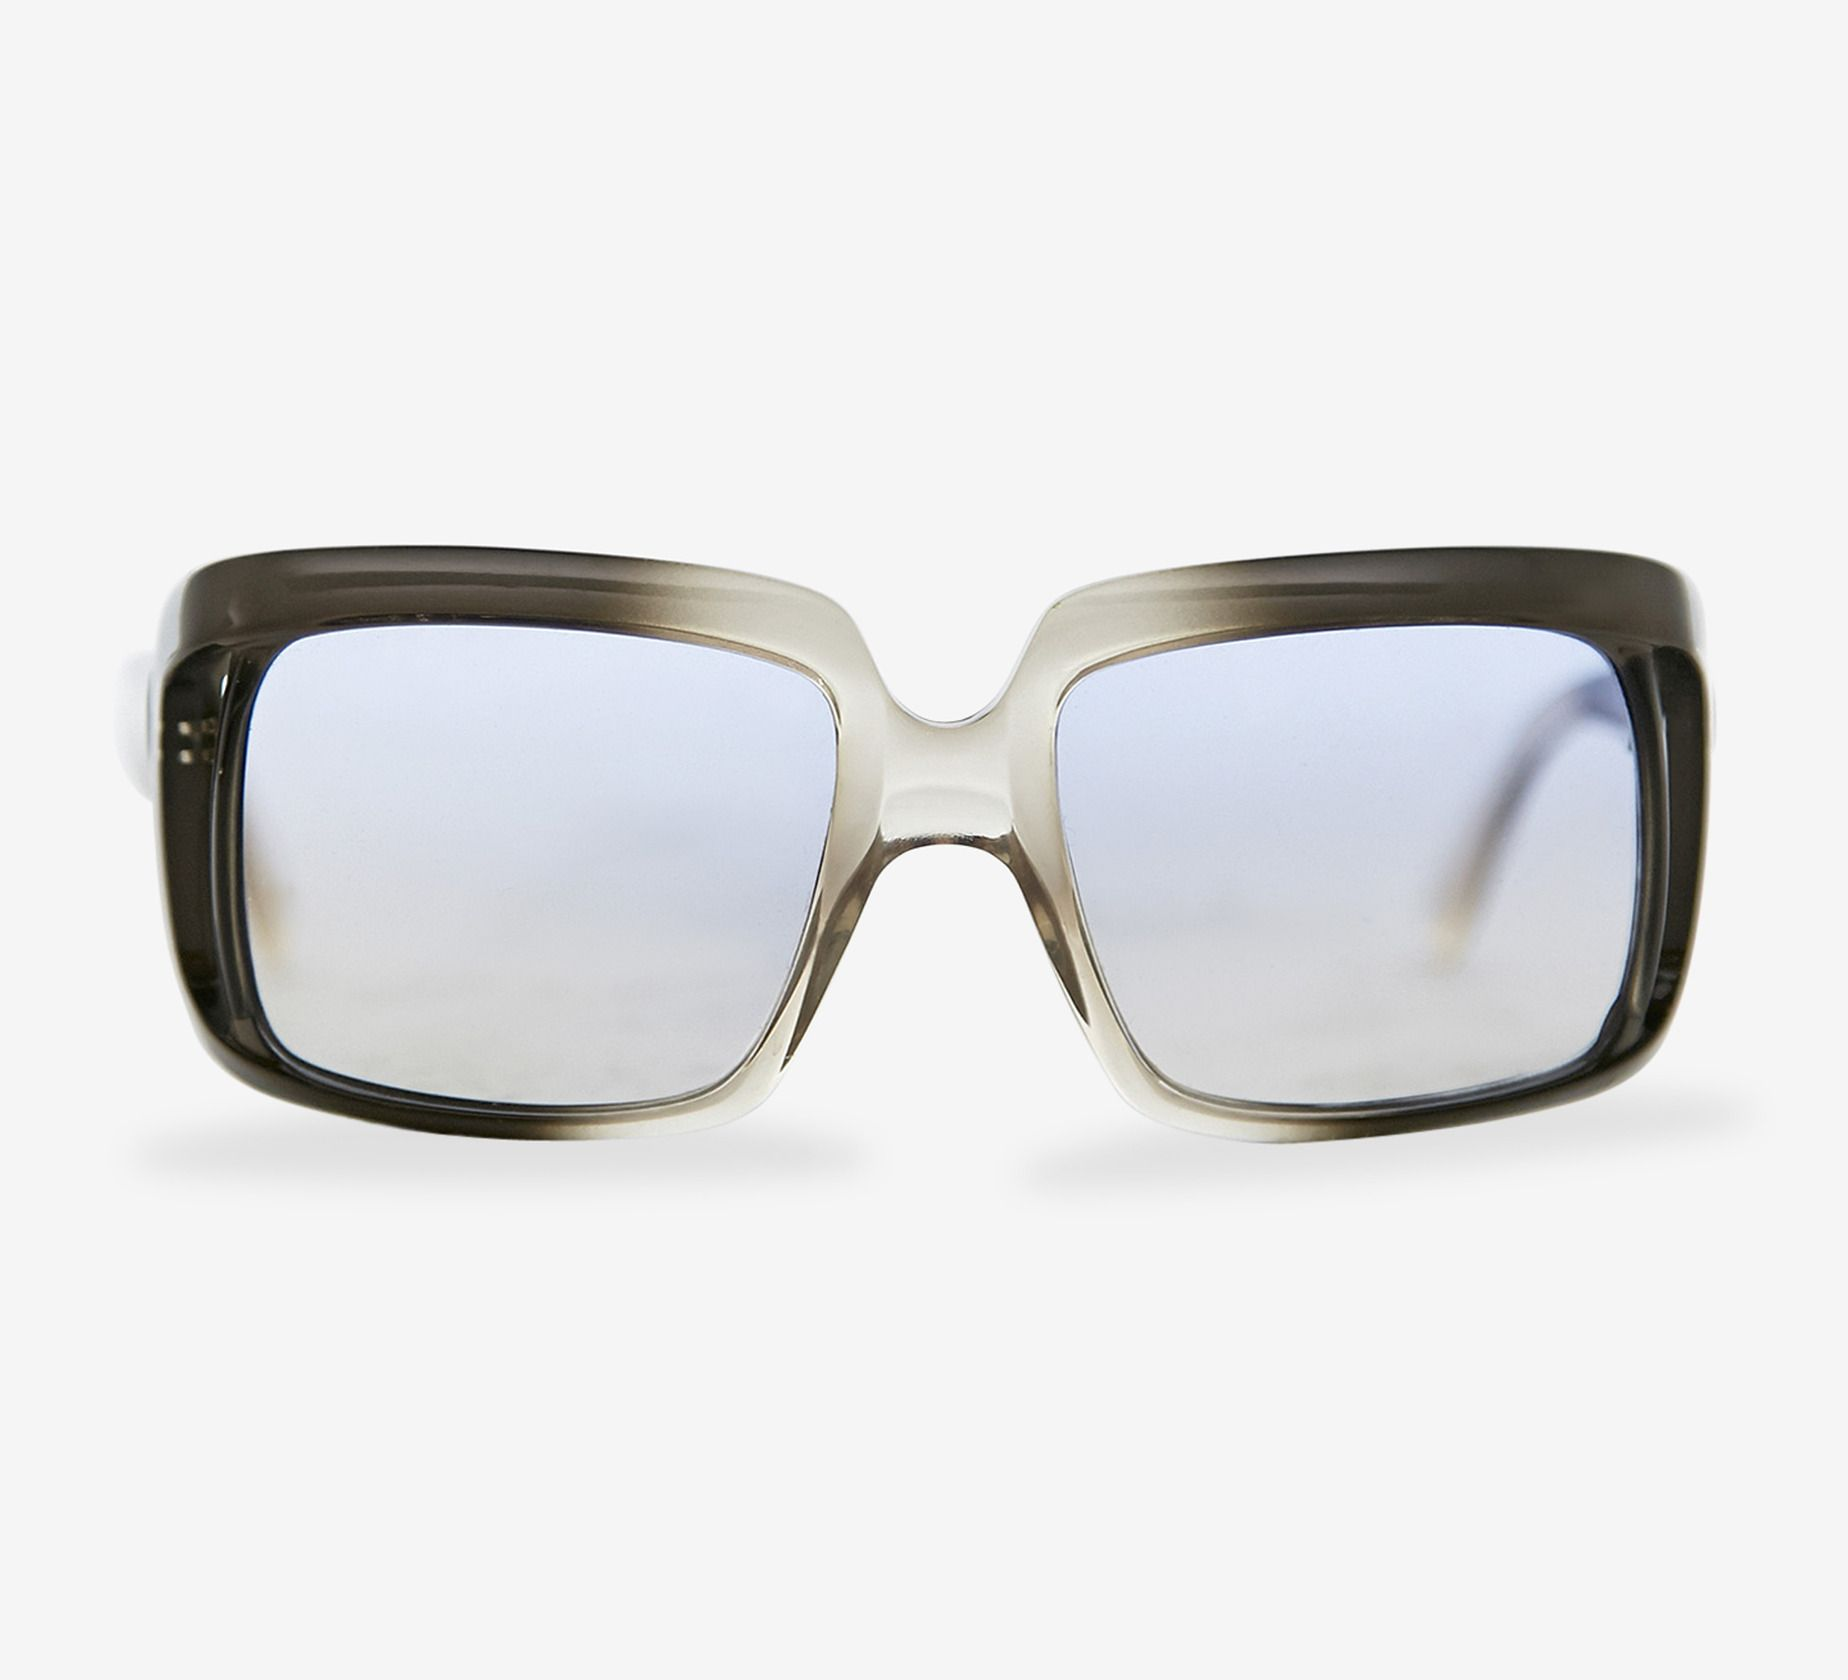 Versace Grey Sunglasses   Glasses ~   Pinterest eb9aaa8e41